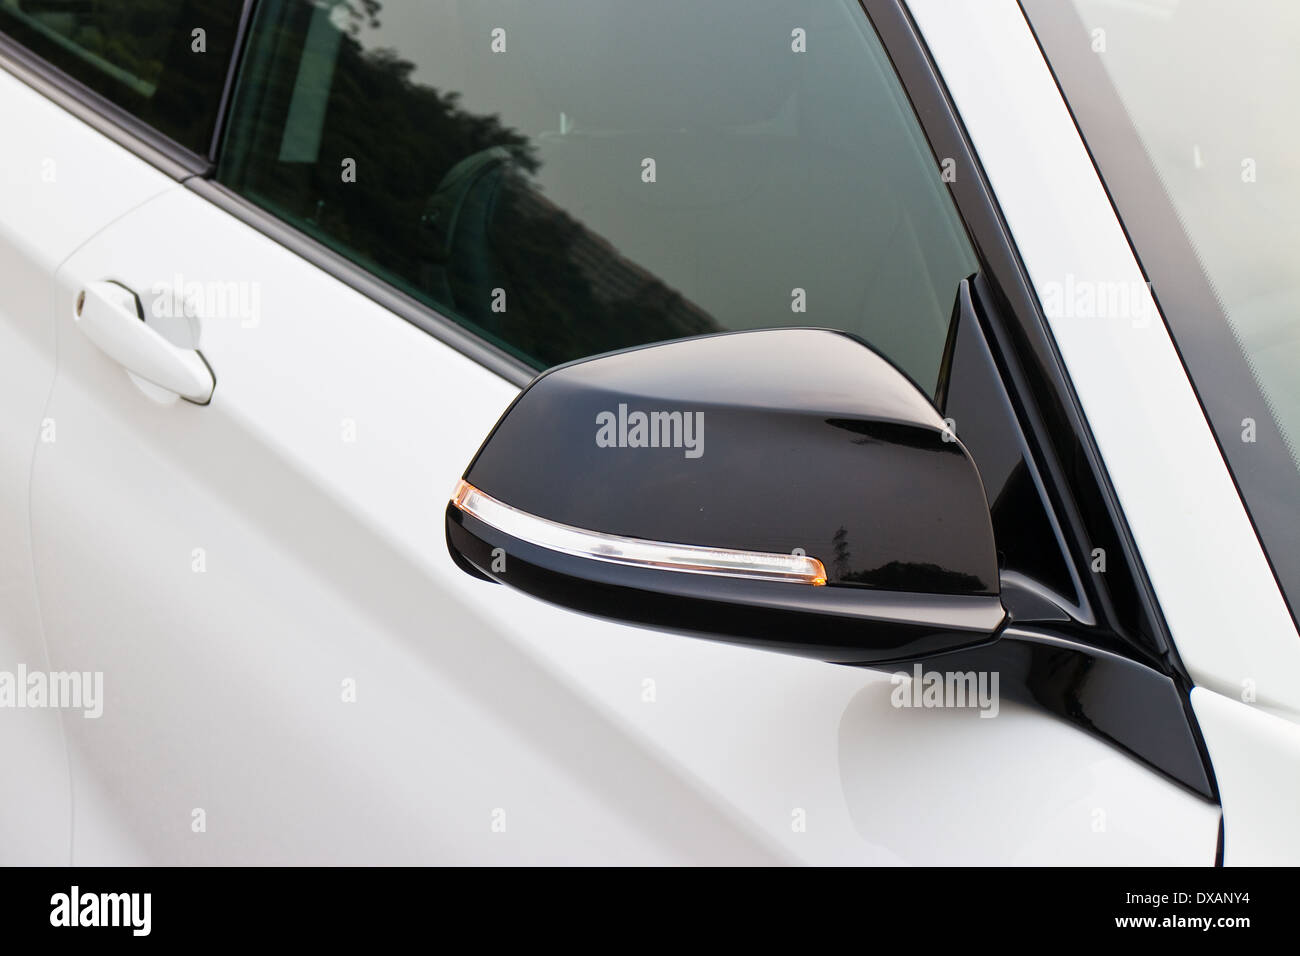 BMW 220i 2014 Sedan, all new series, small sedan. - Stock Image